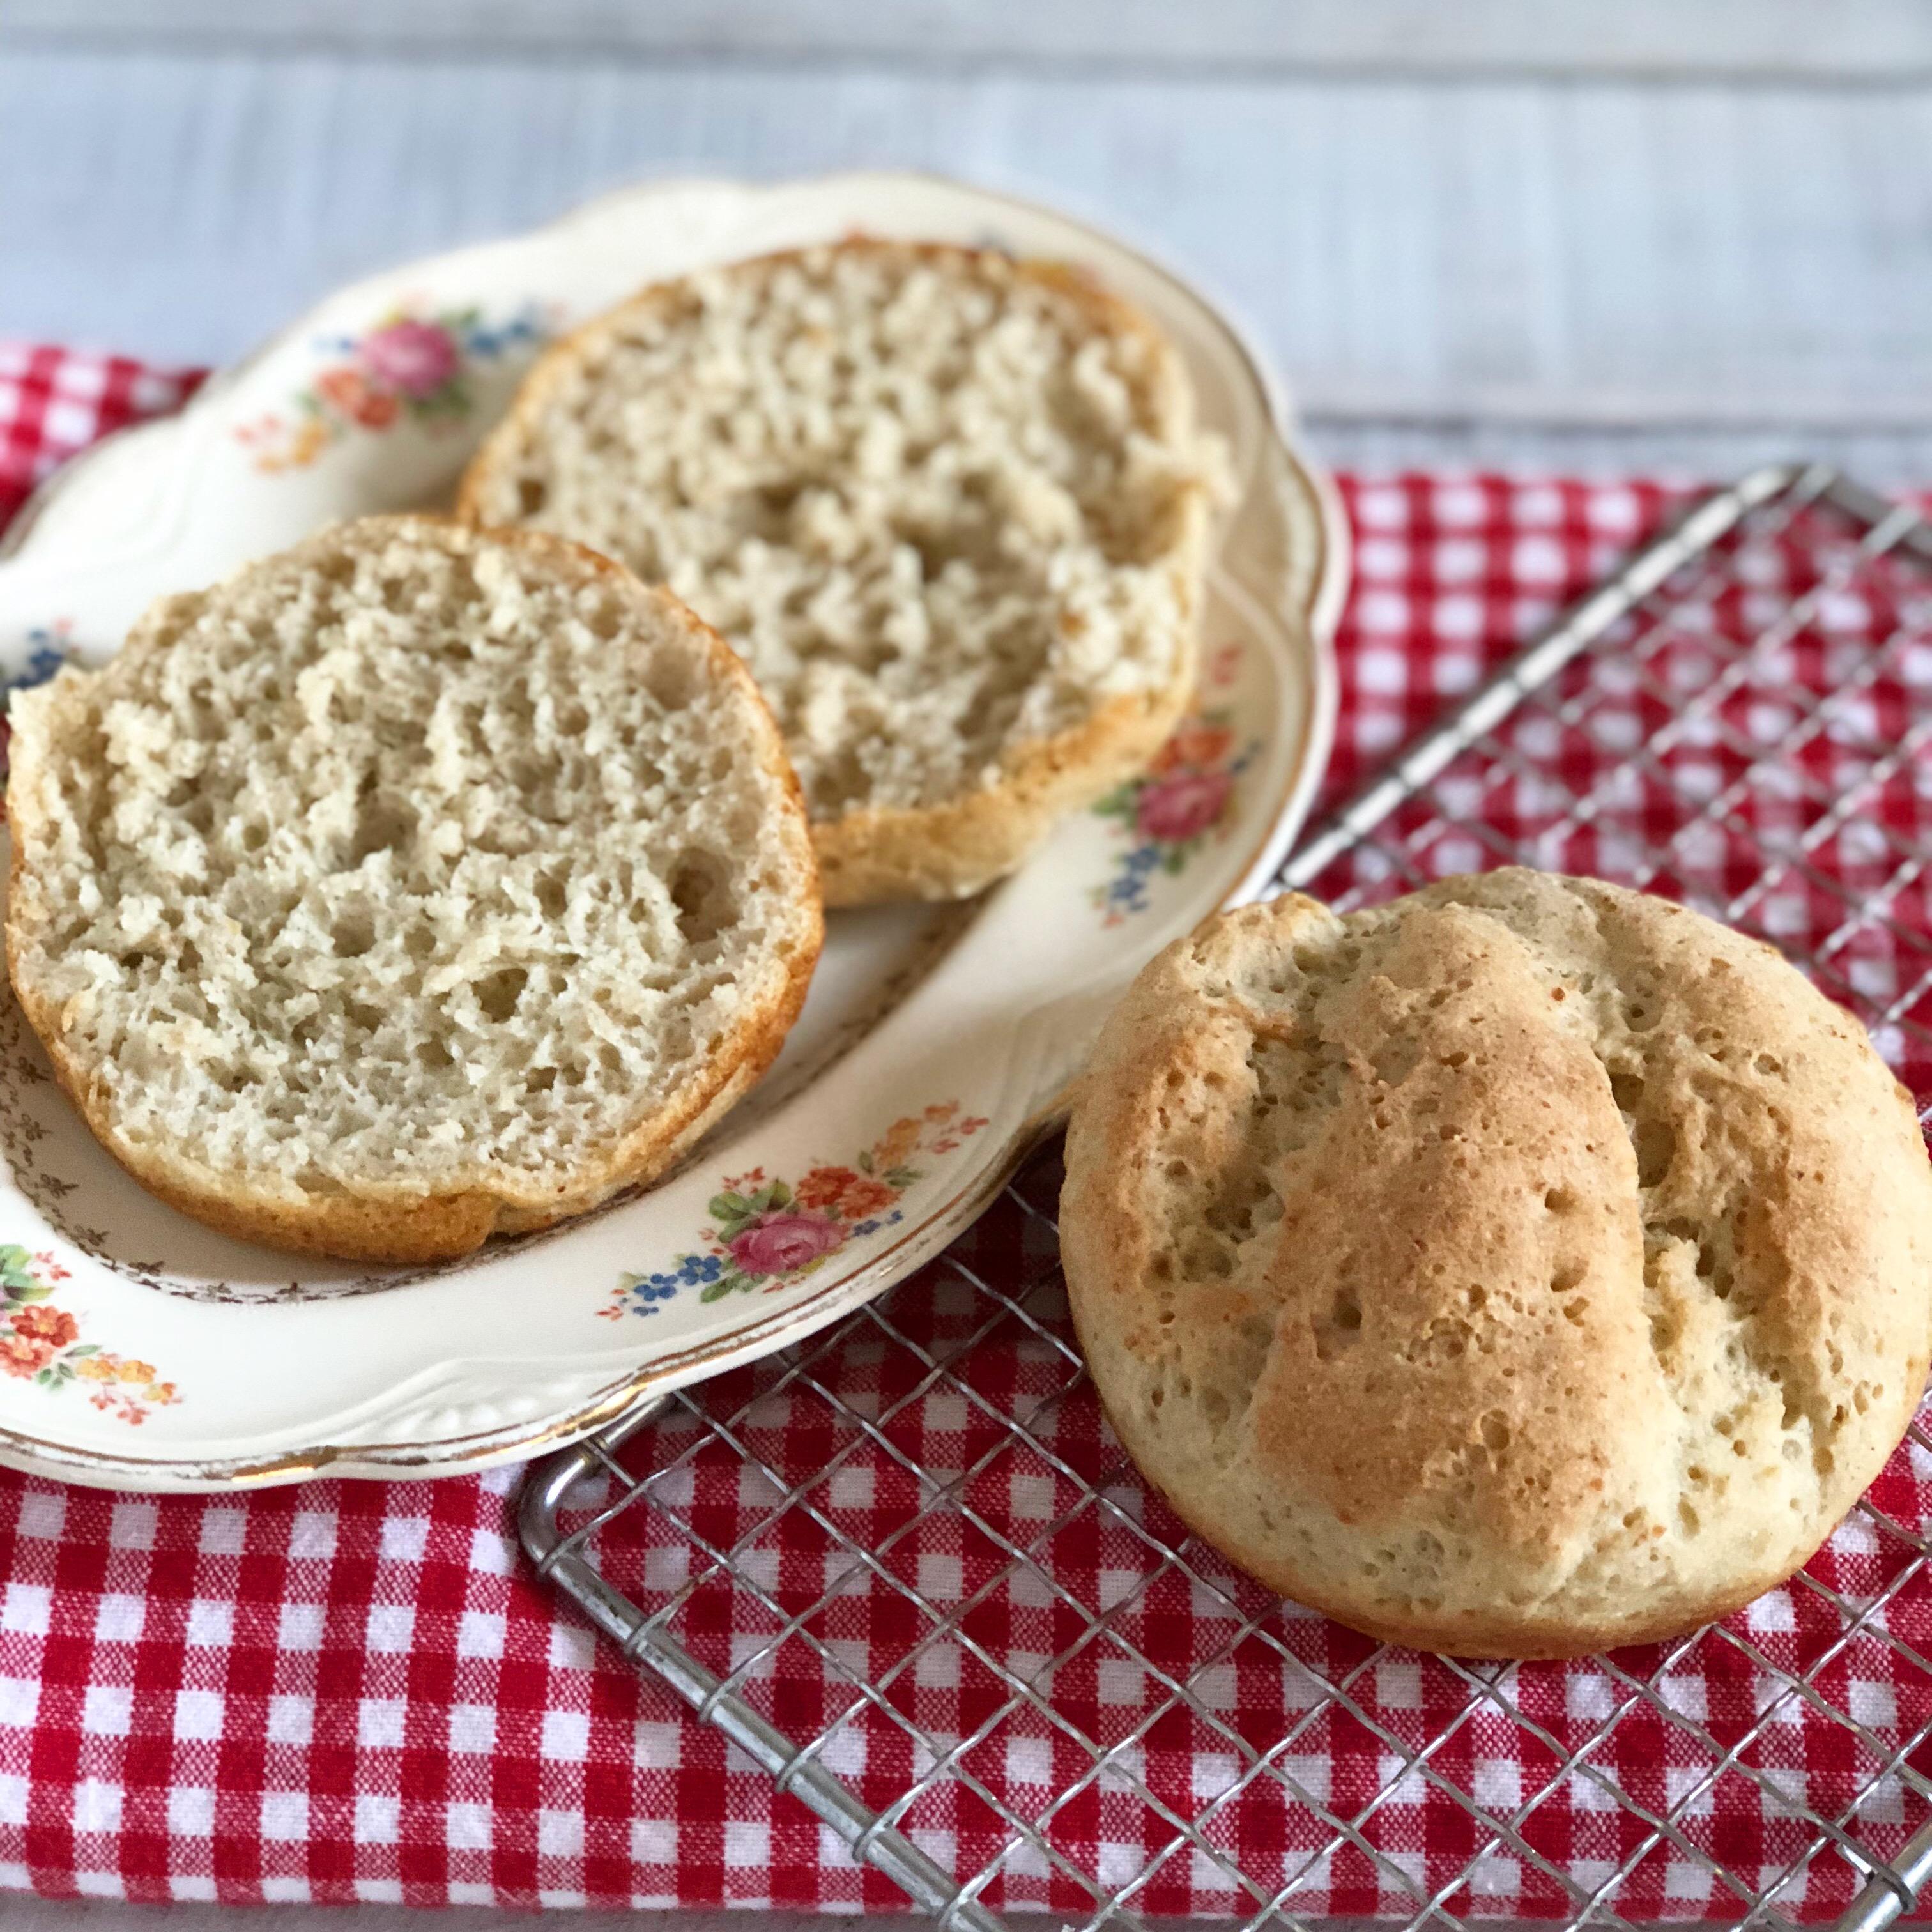 A photo of soft whole grain gluten-free + vegan burger buns | Julie's Kitchenette